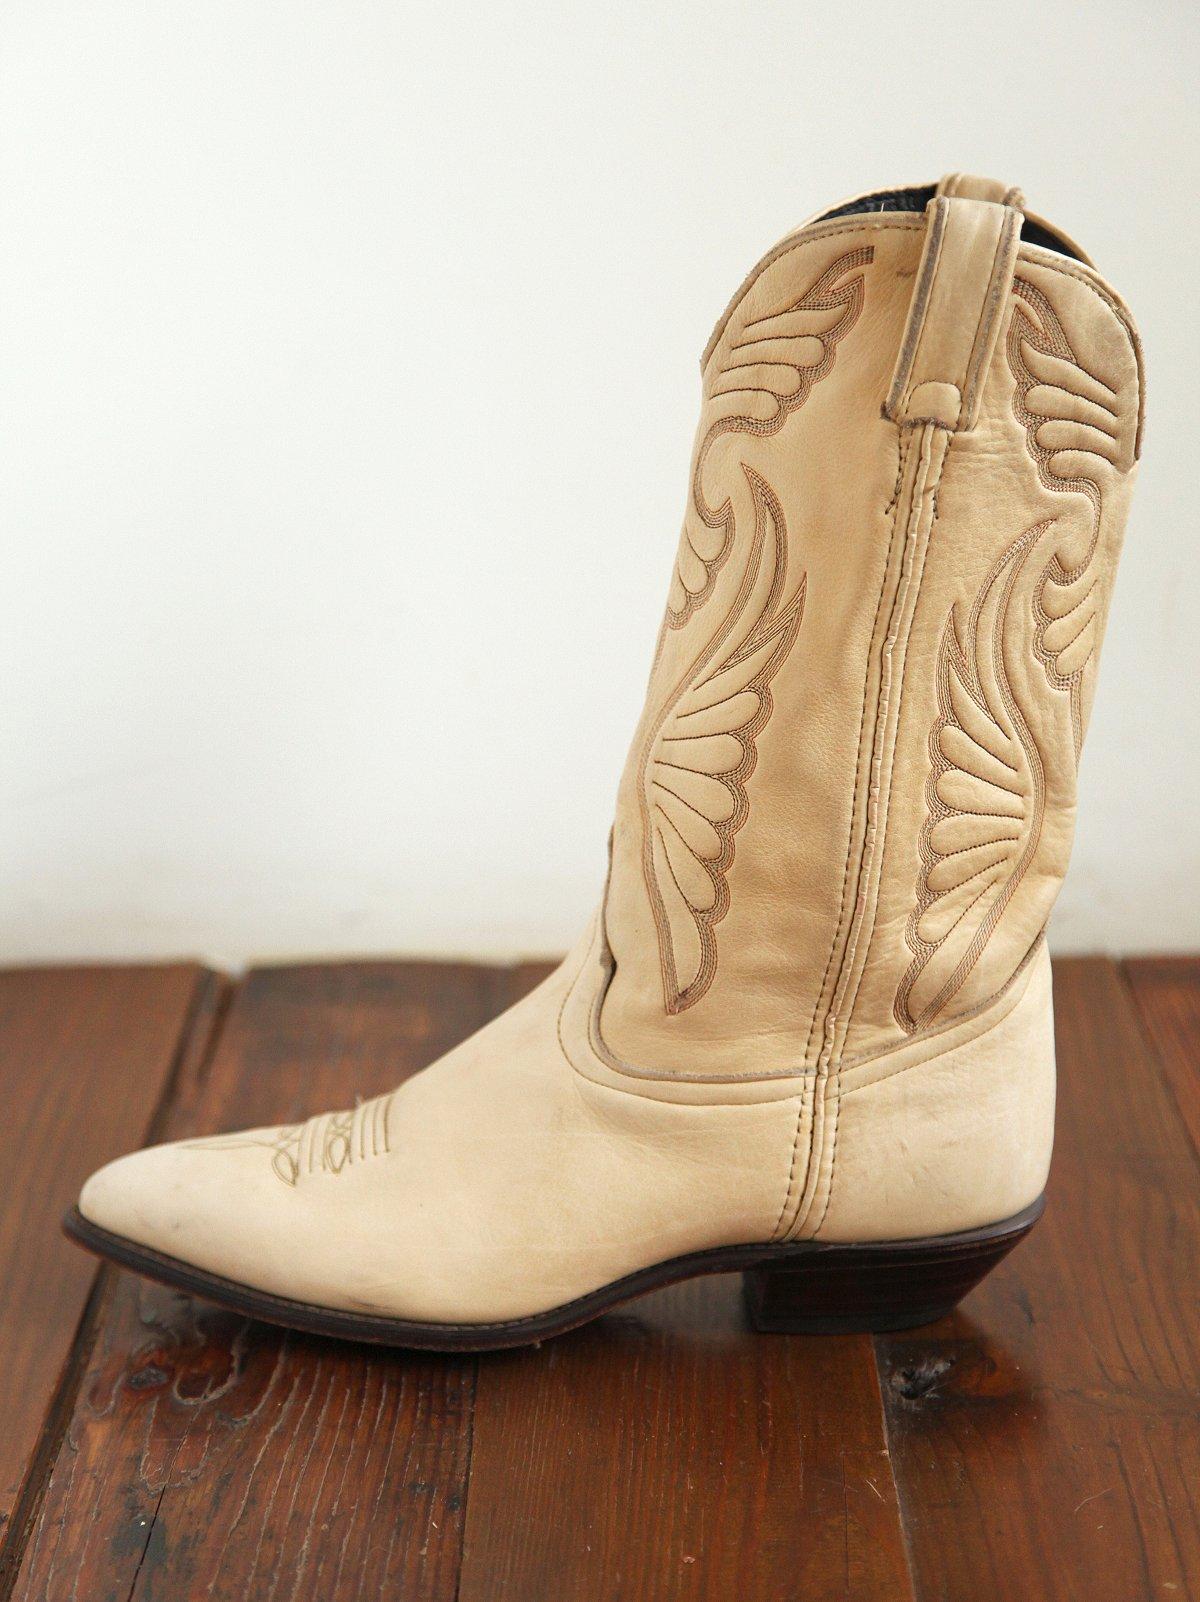 Vintage Cream Leather Cowboy Boots